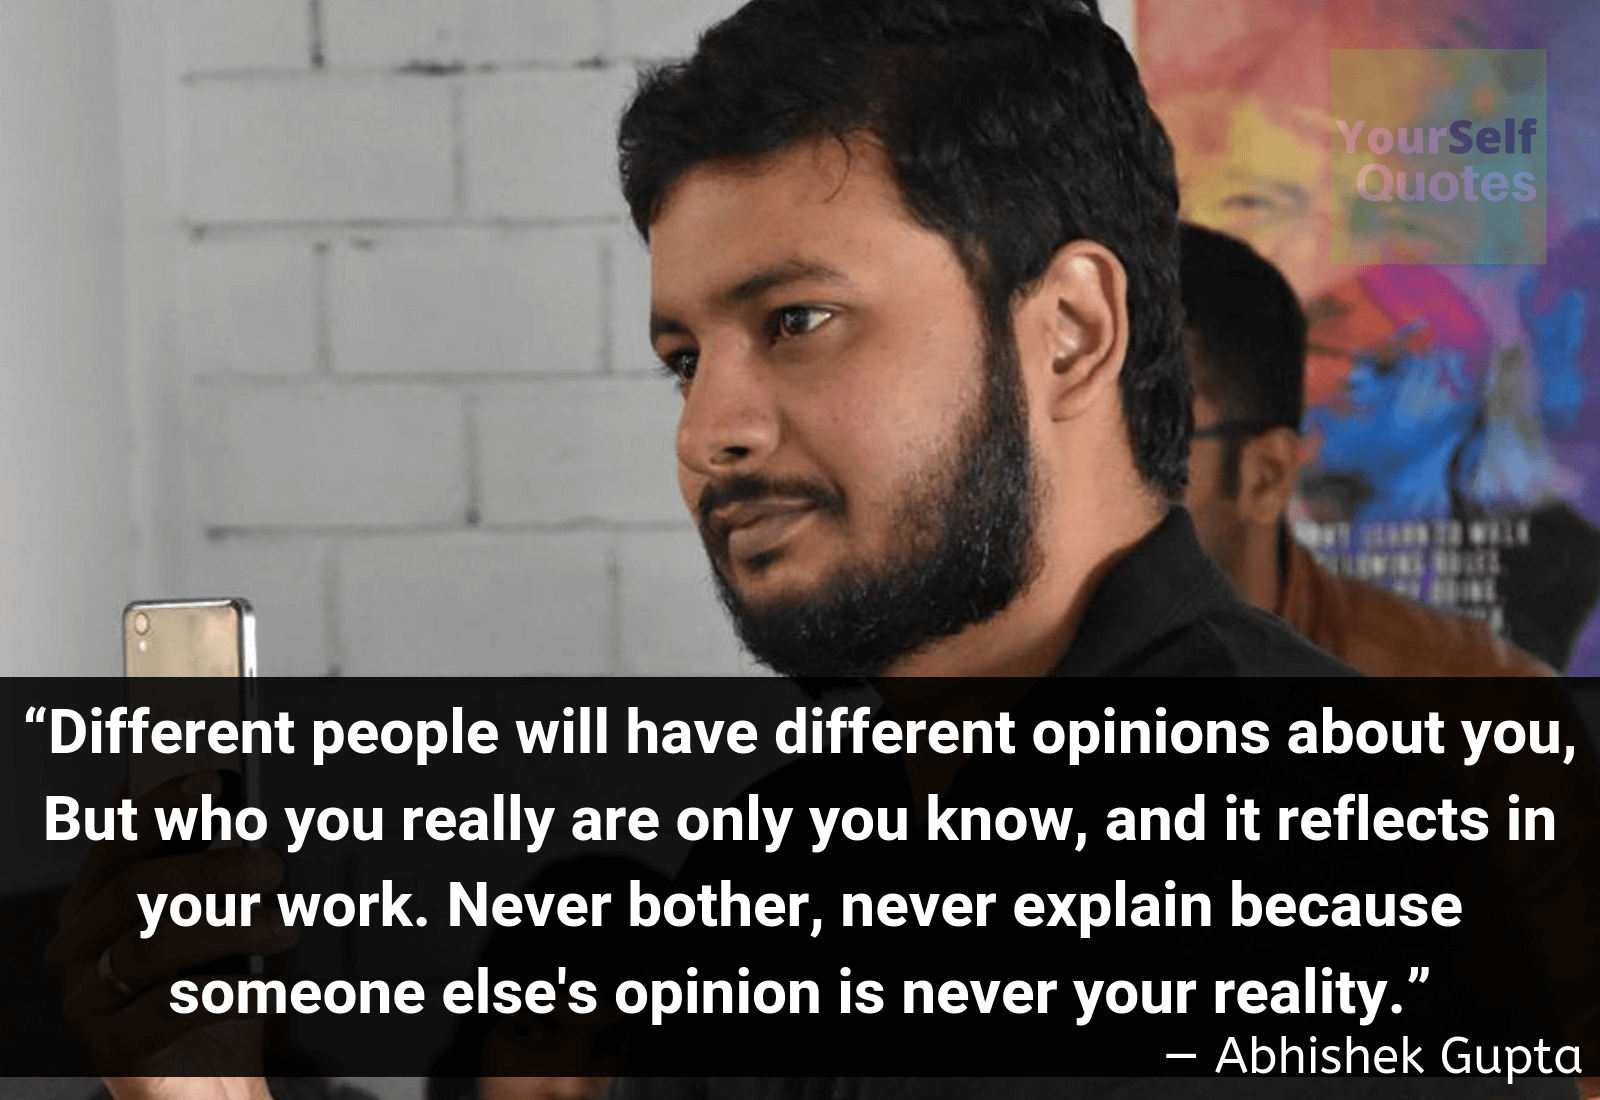 Quotes by Abhishek Gupta